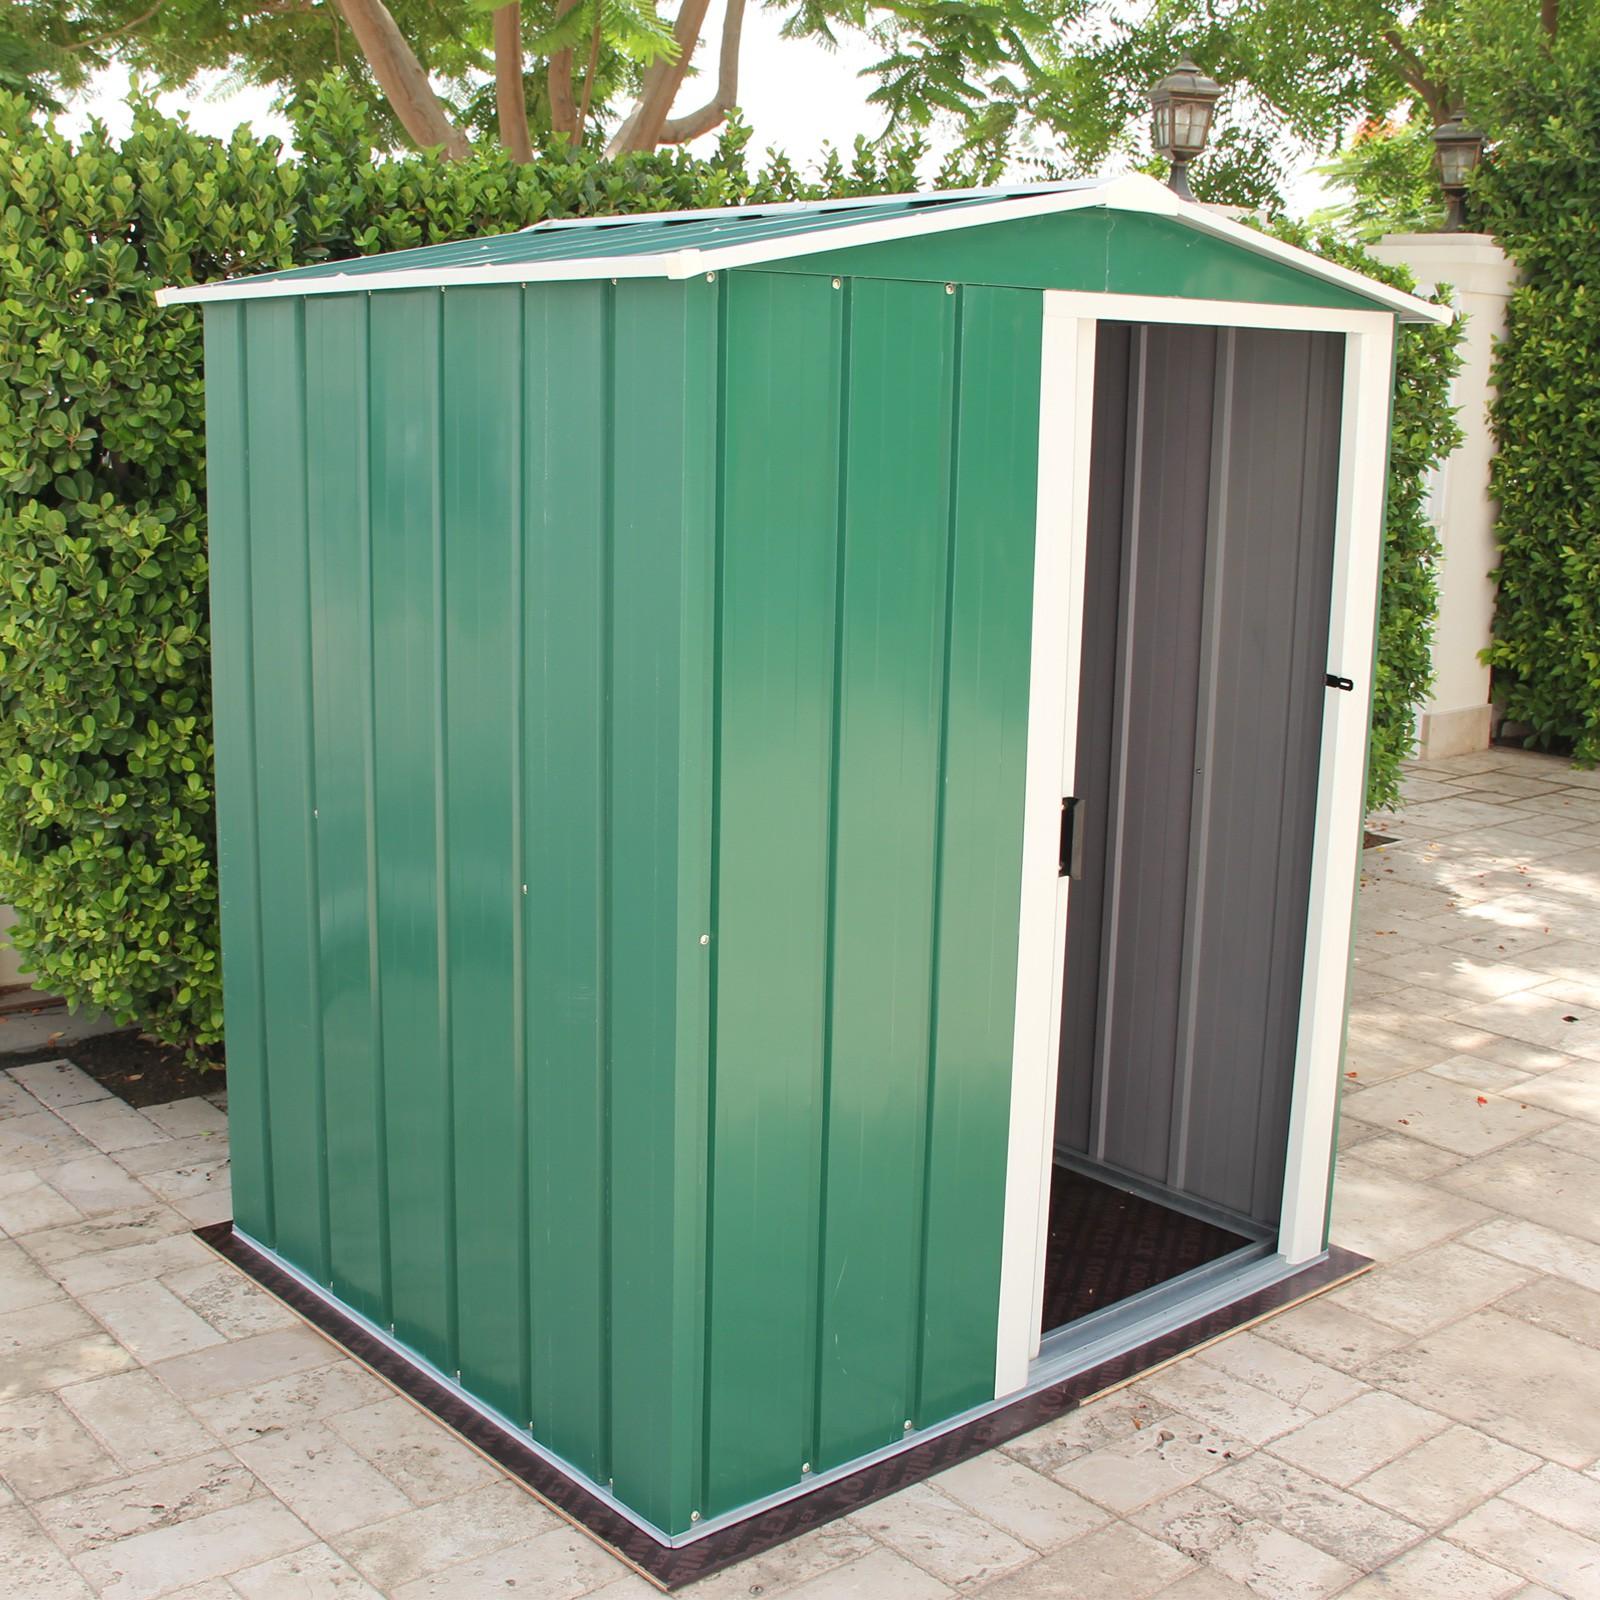 tepro metall ger tehaus gartenhaus eco 5x4 gr n. Black Bedroom Furniture Sets. Home Design Ideas